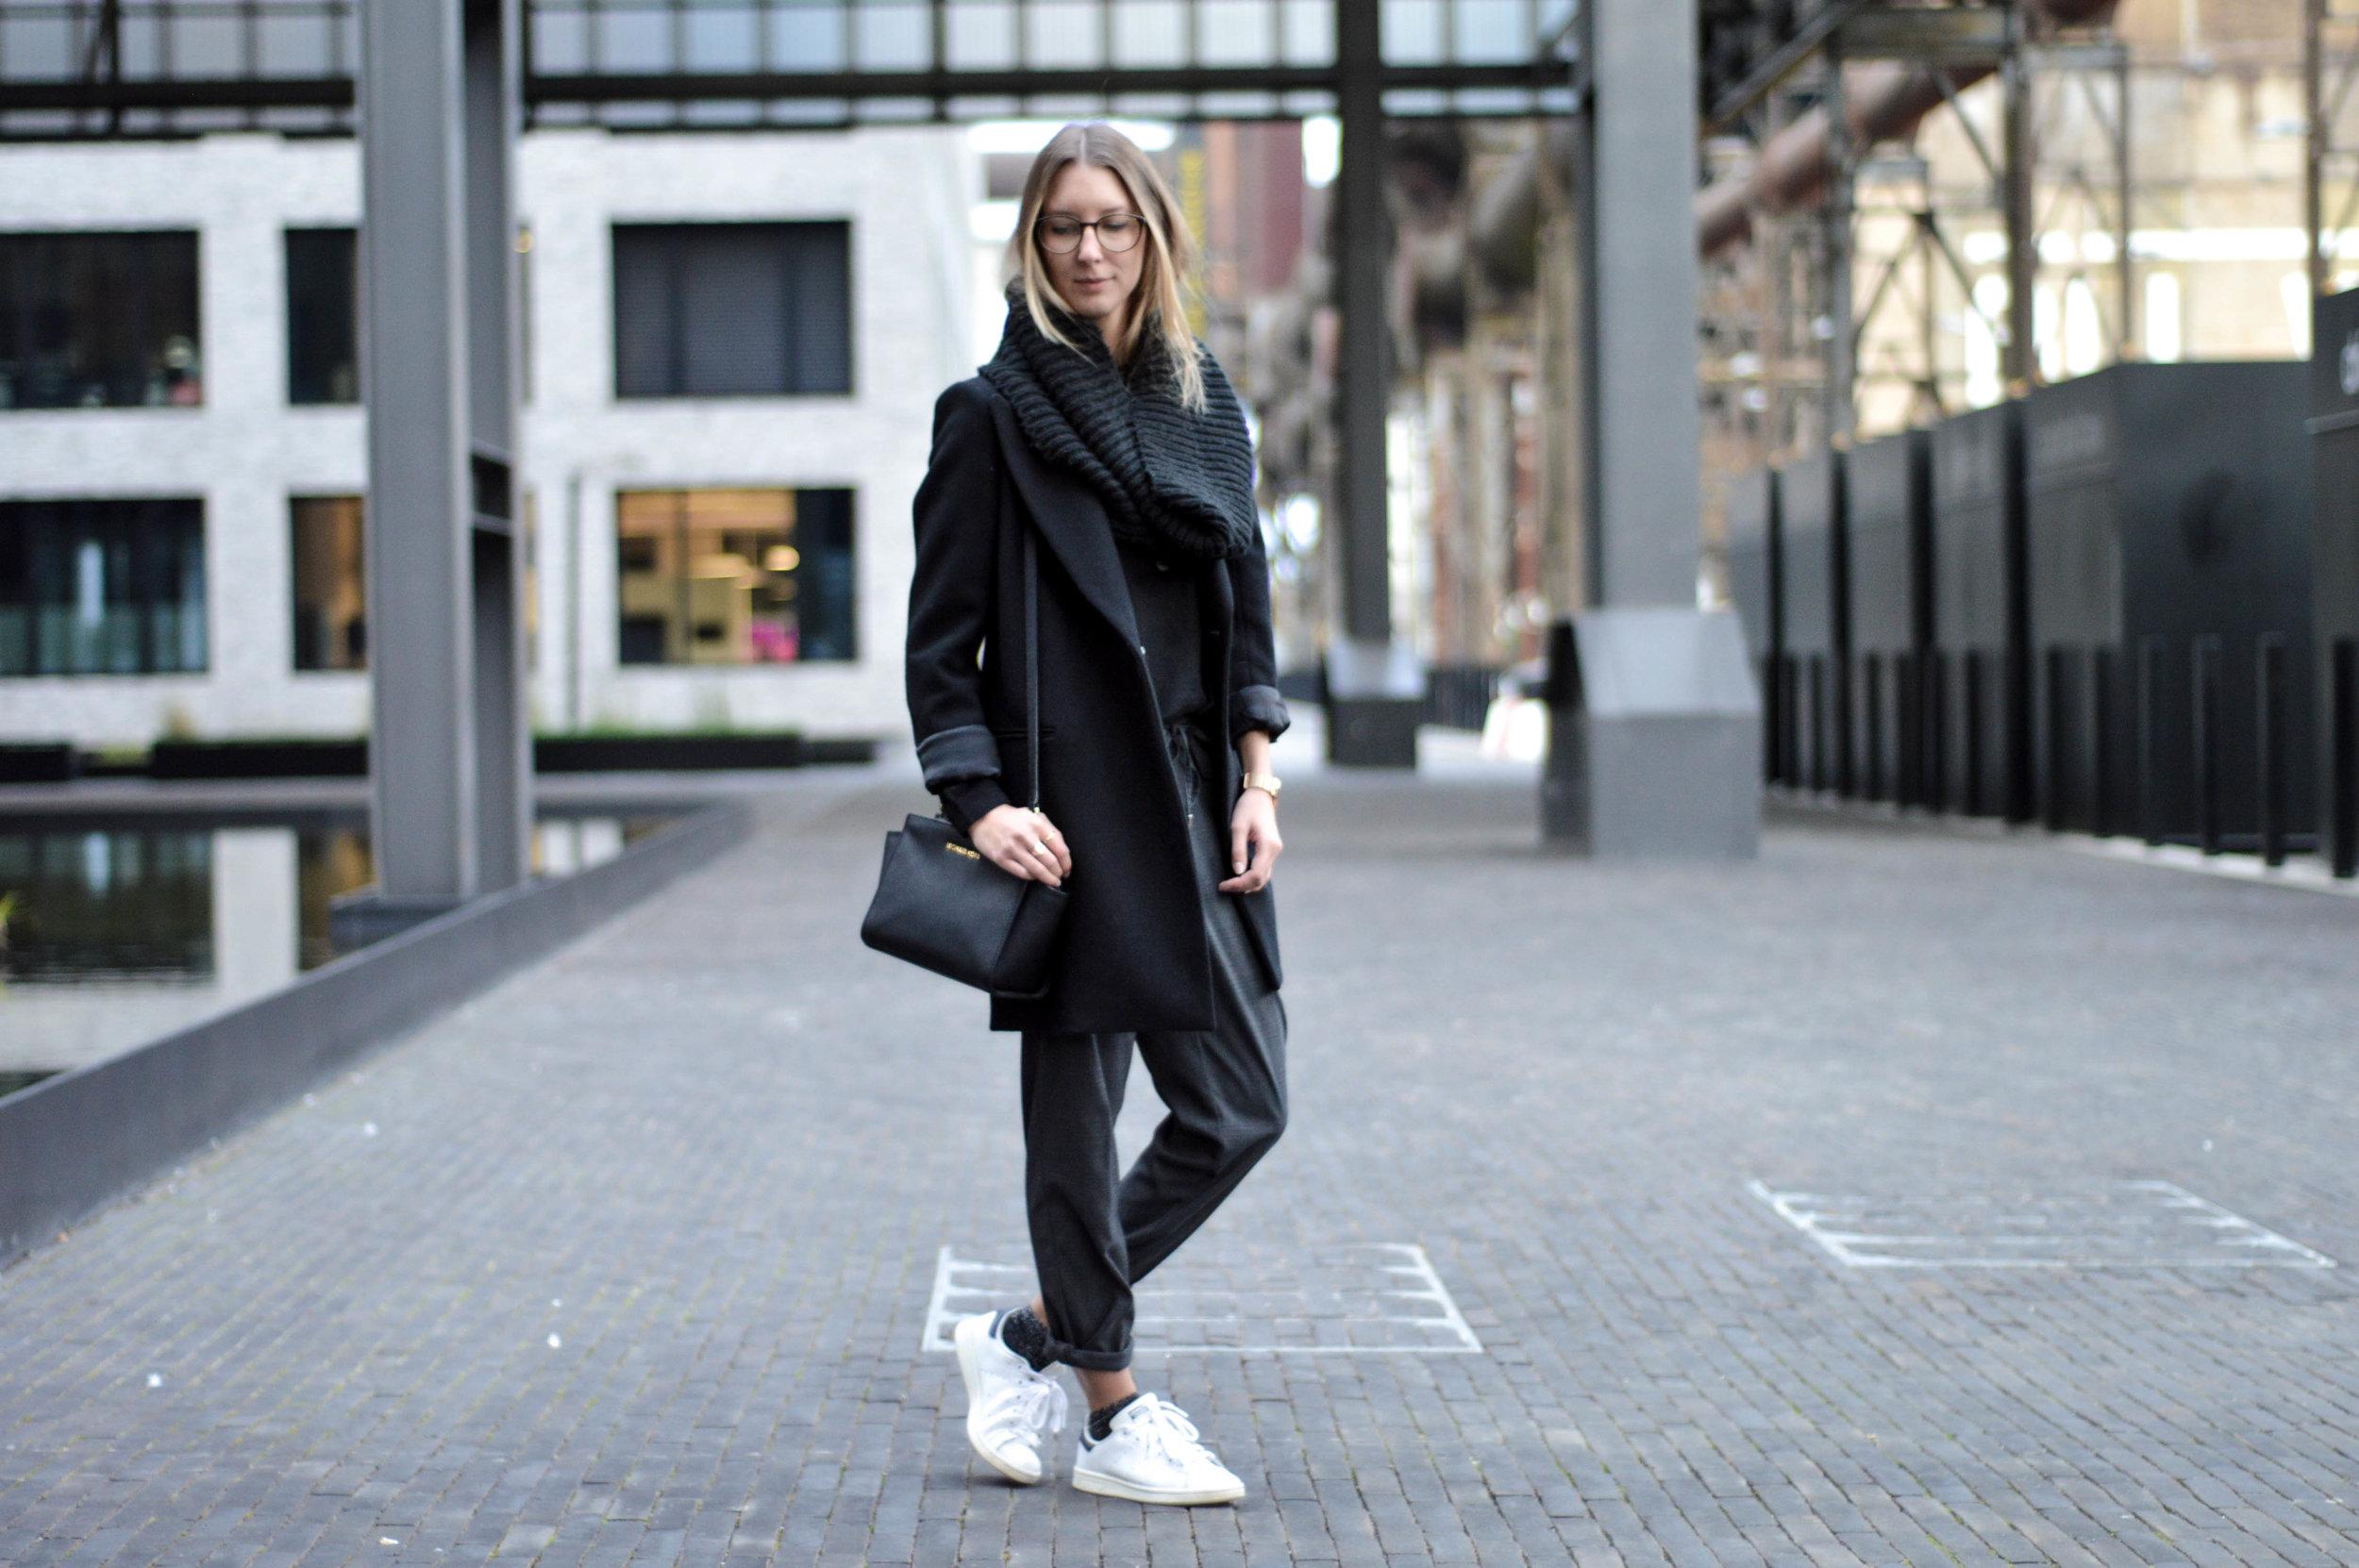 Winter Outfit - OSIARAH.COM (8 of 12).jpg